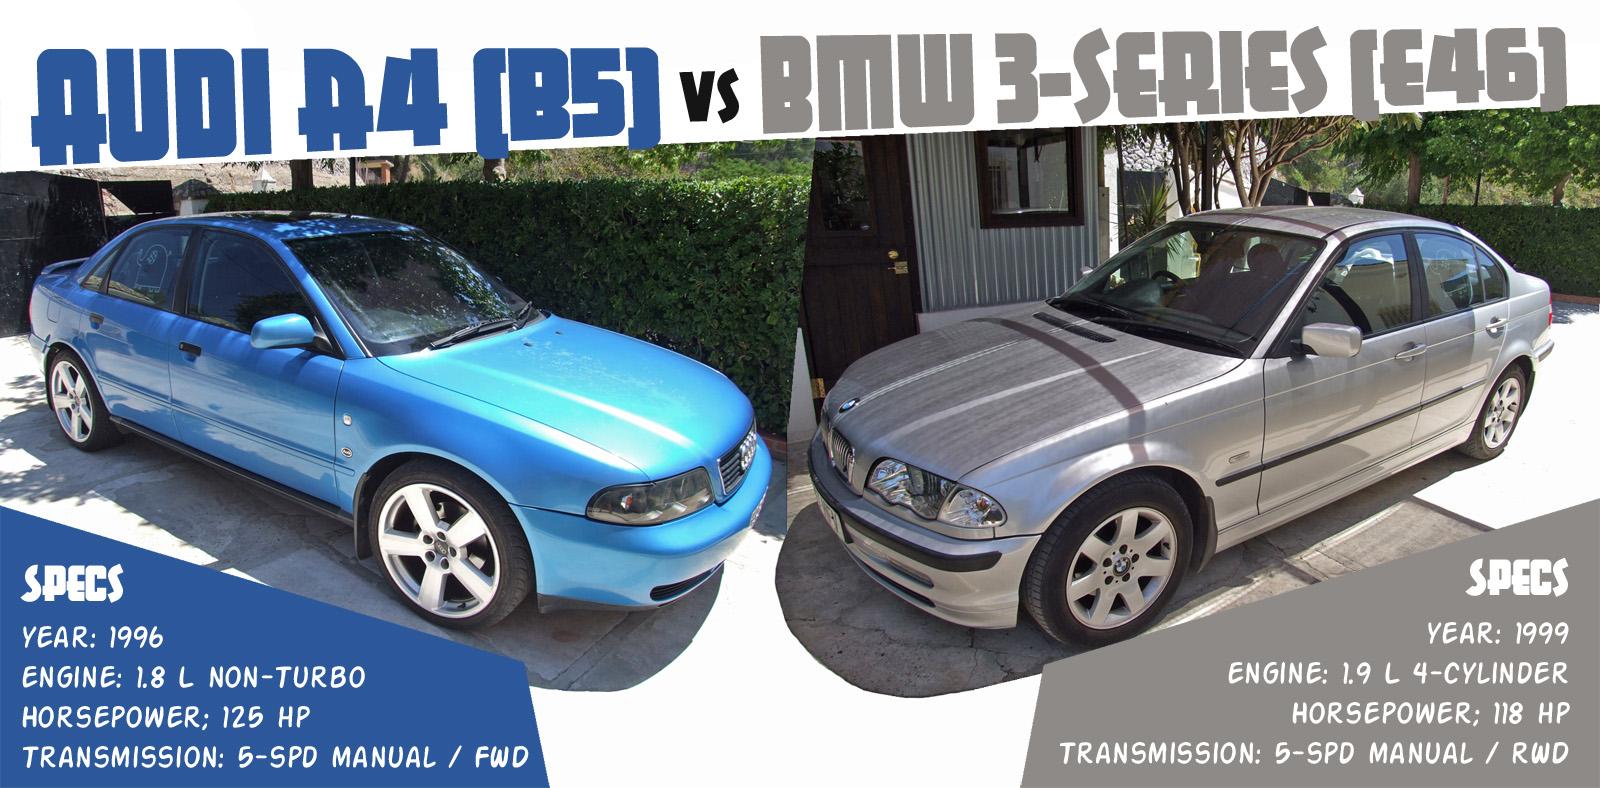 BMW Series E Vs Audi A B Buyers Guide Disenoartcom - Bmw 328i vs audi a4